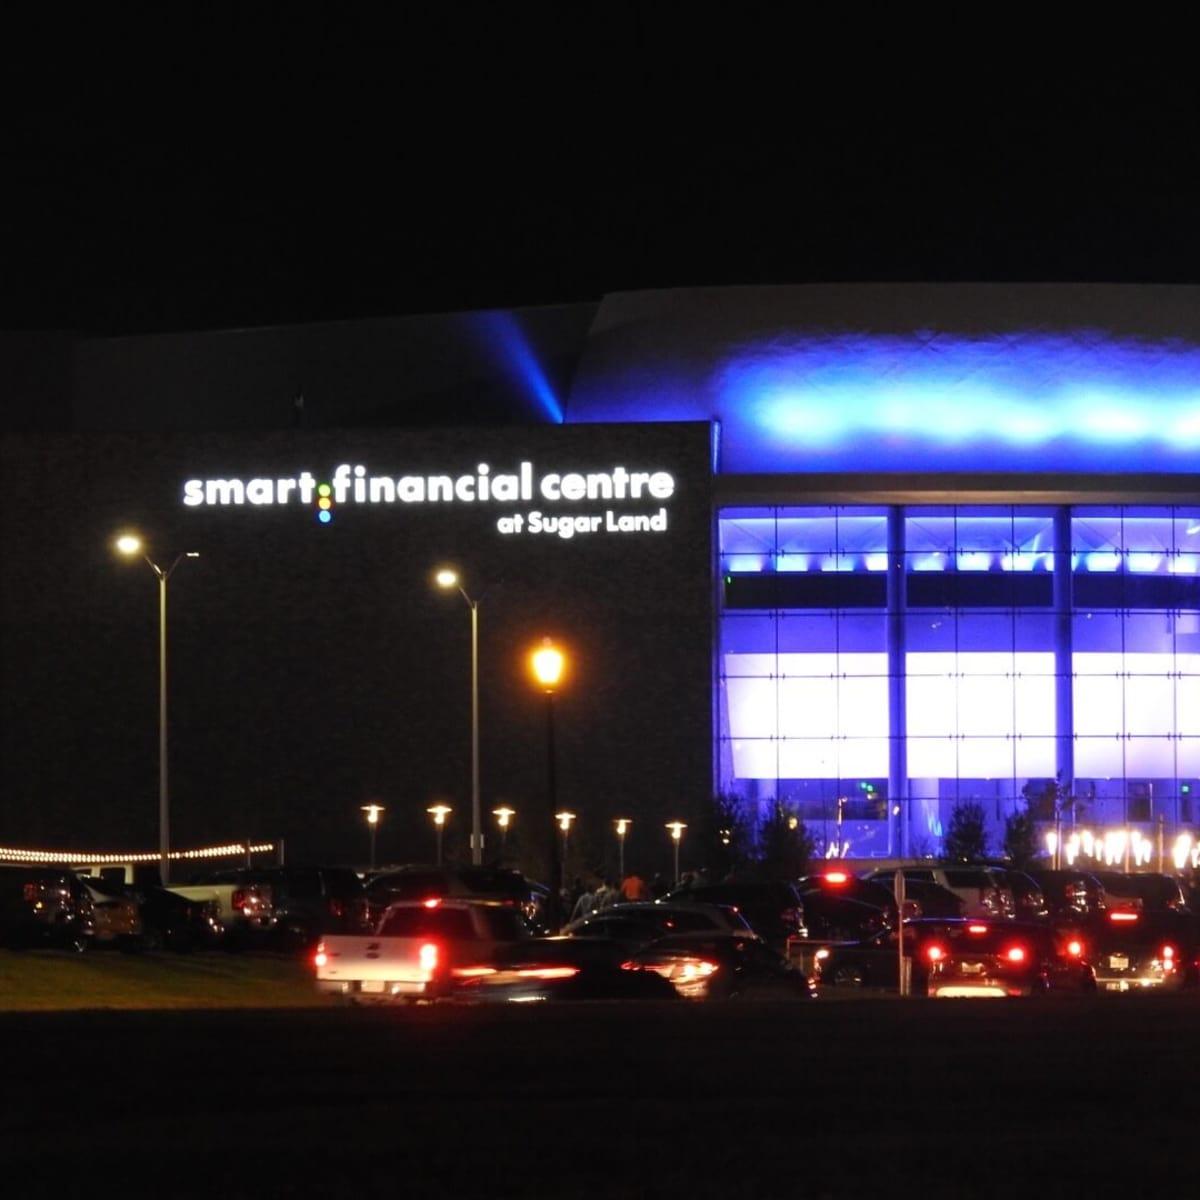 Smart Financial Centre at Sugar Land exterior